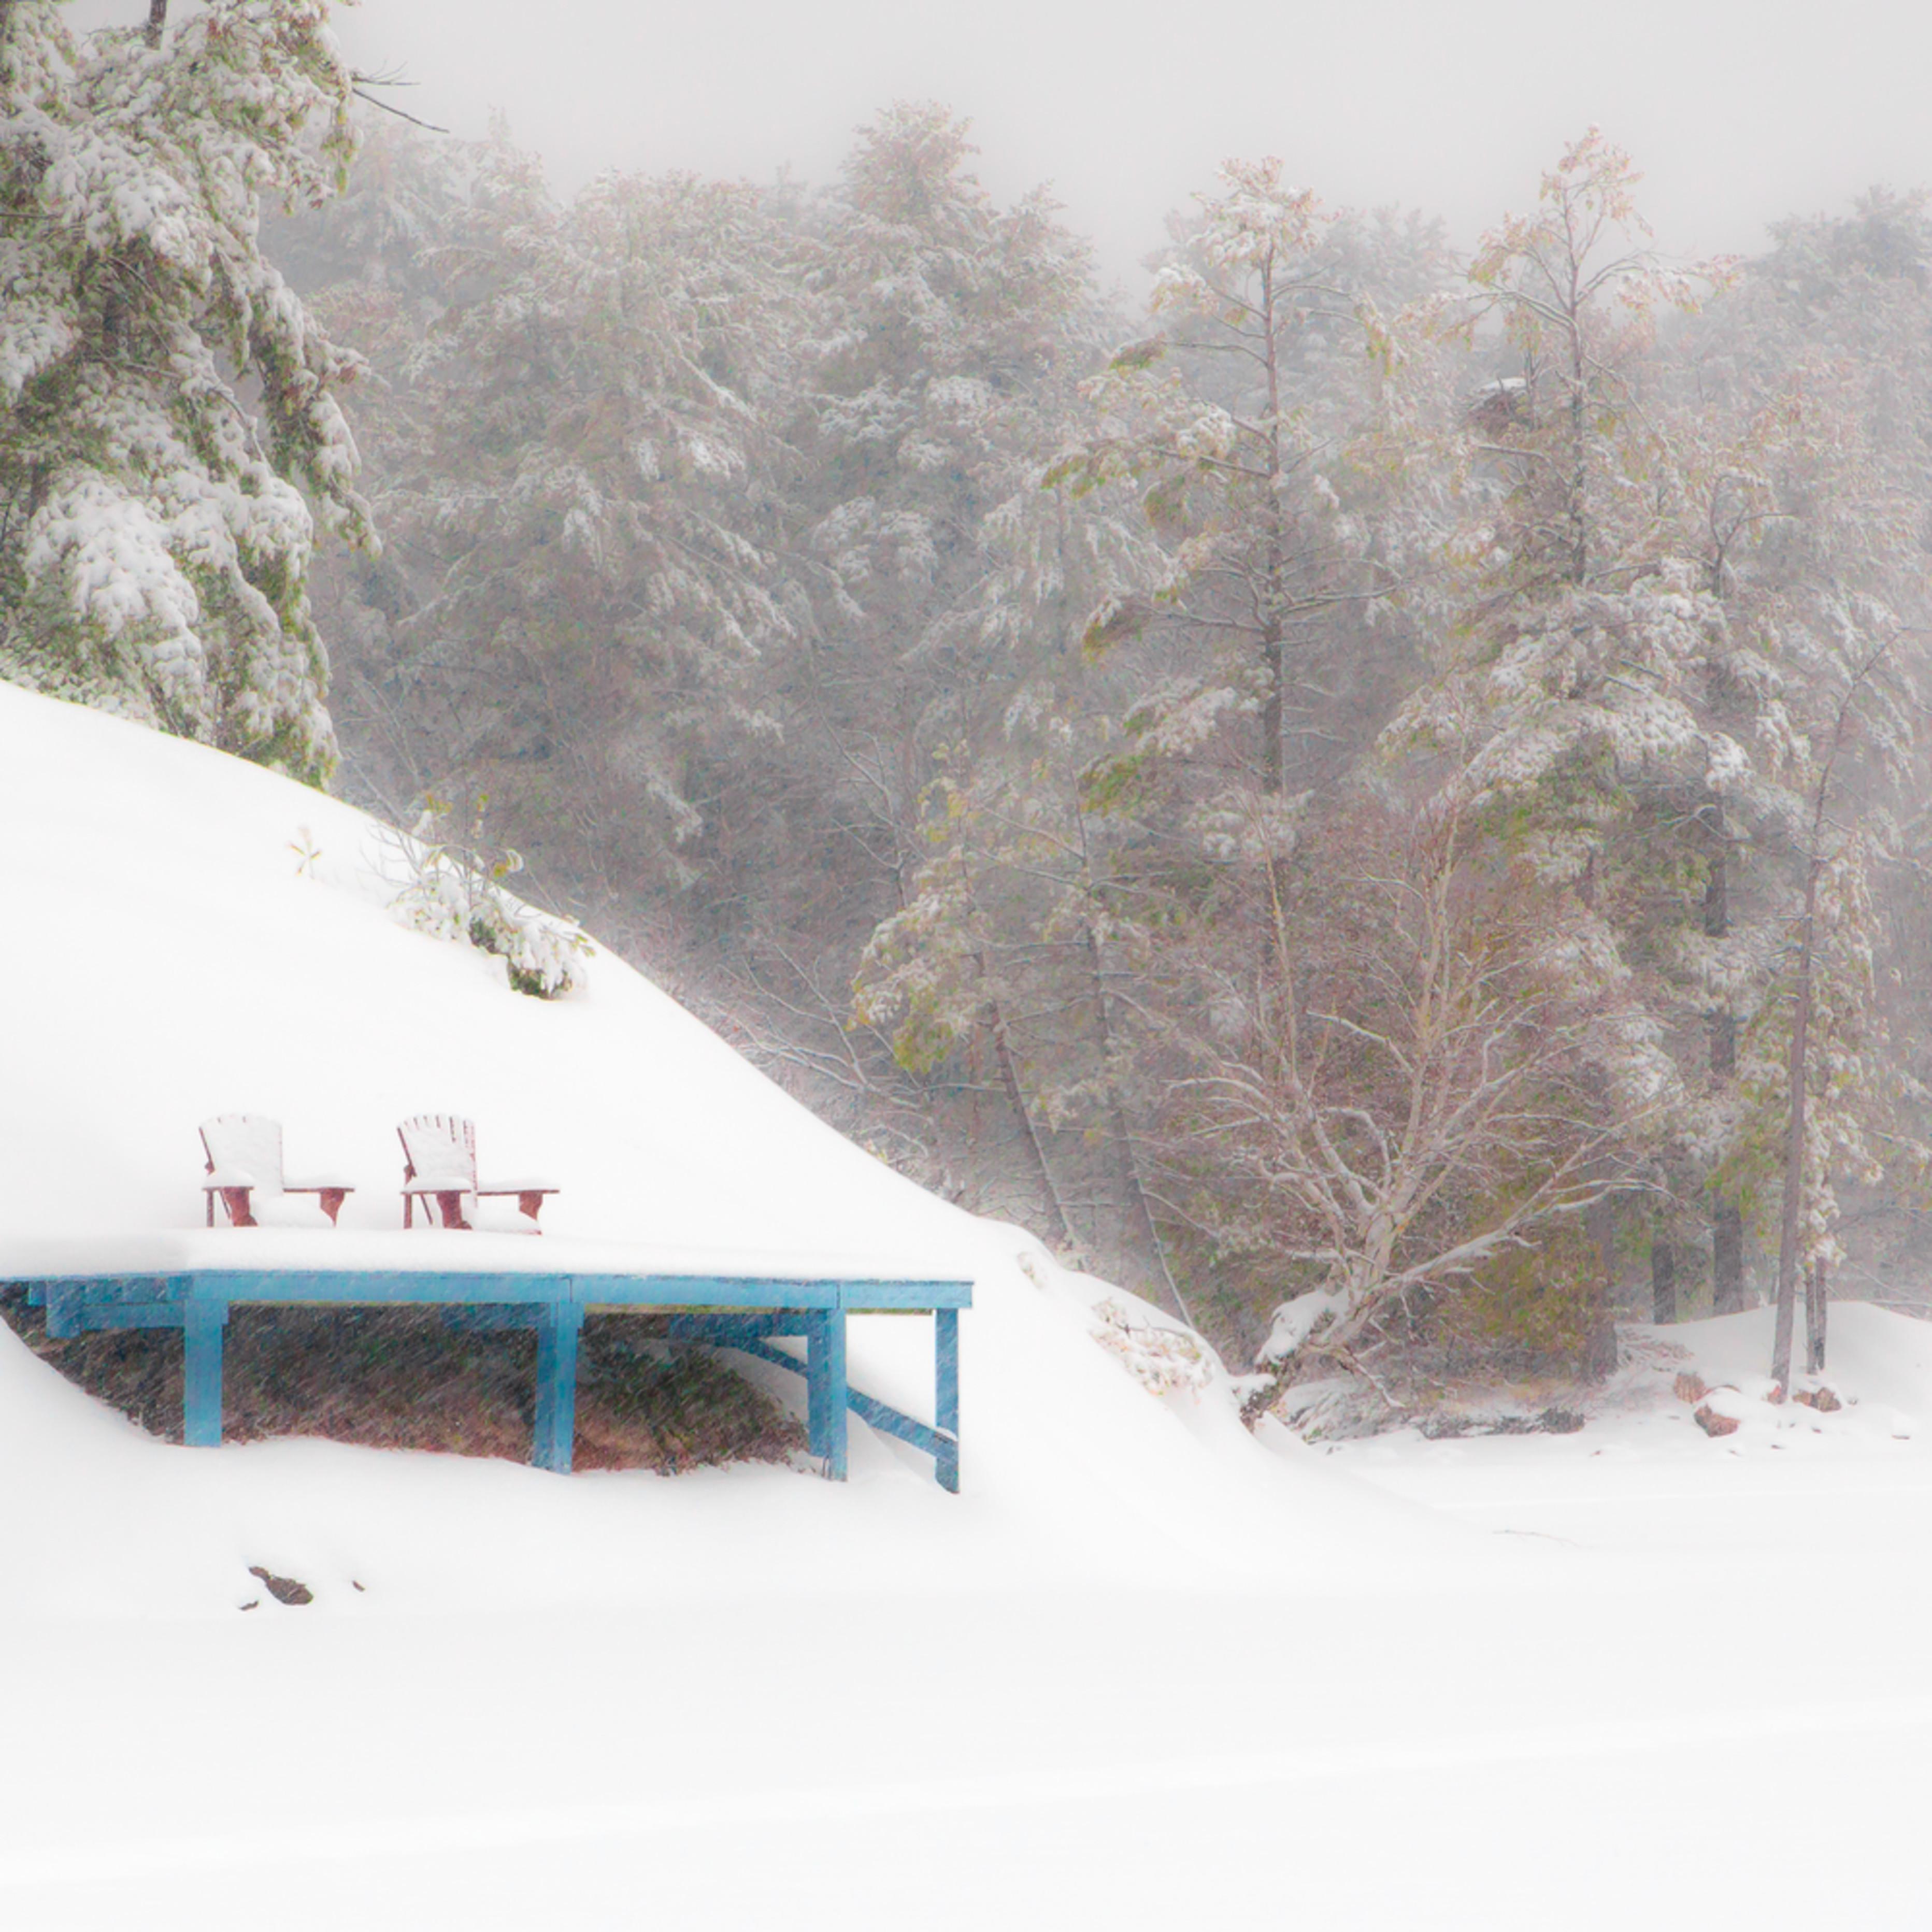 The snowstorm carfrh